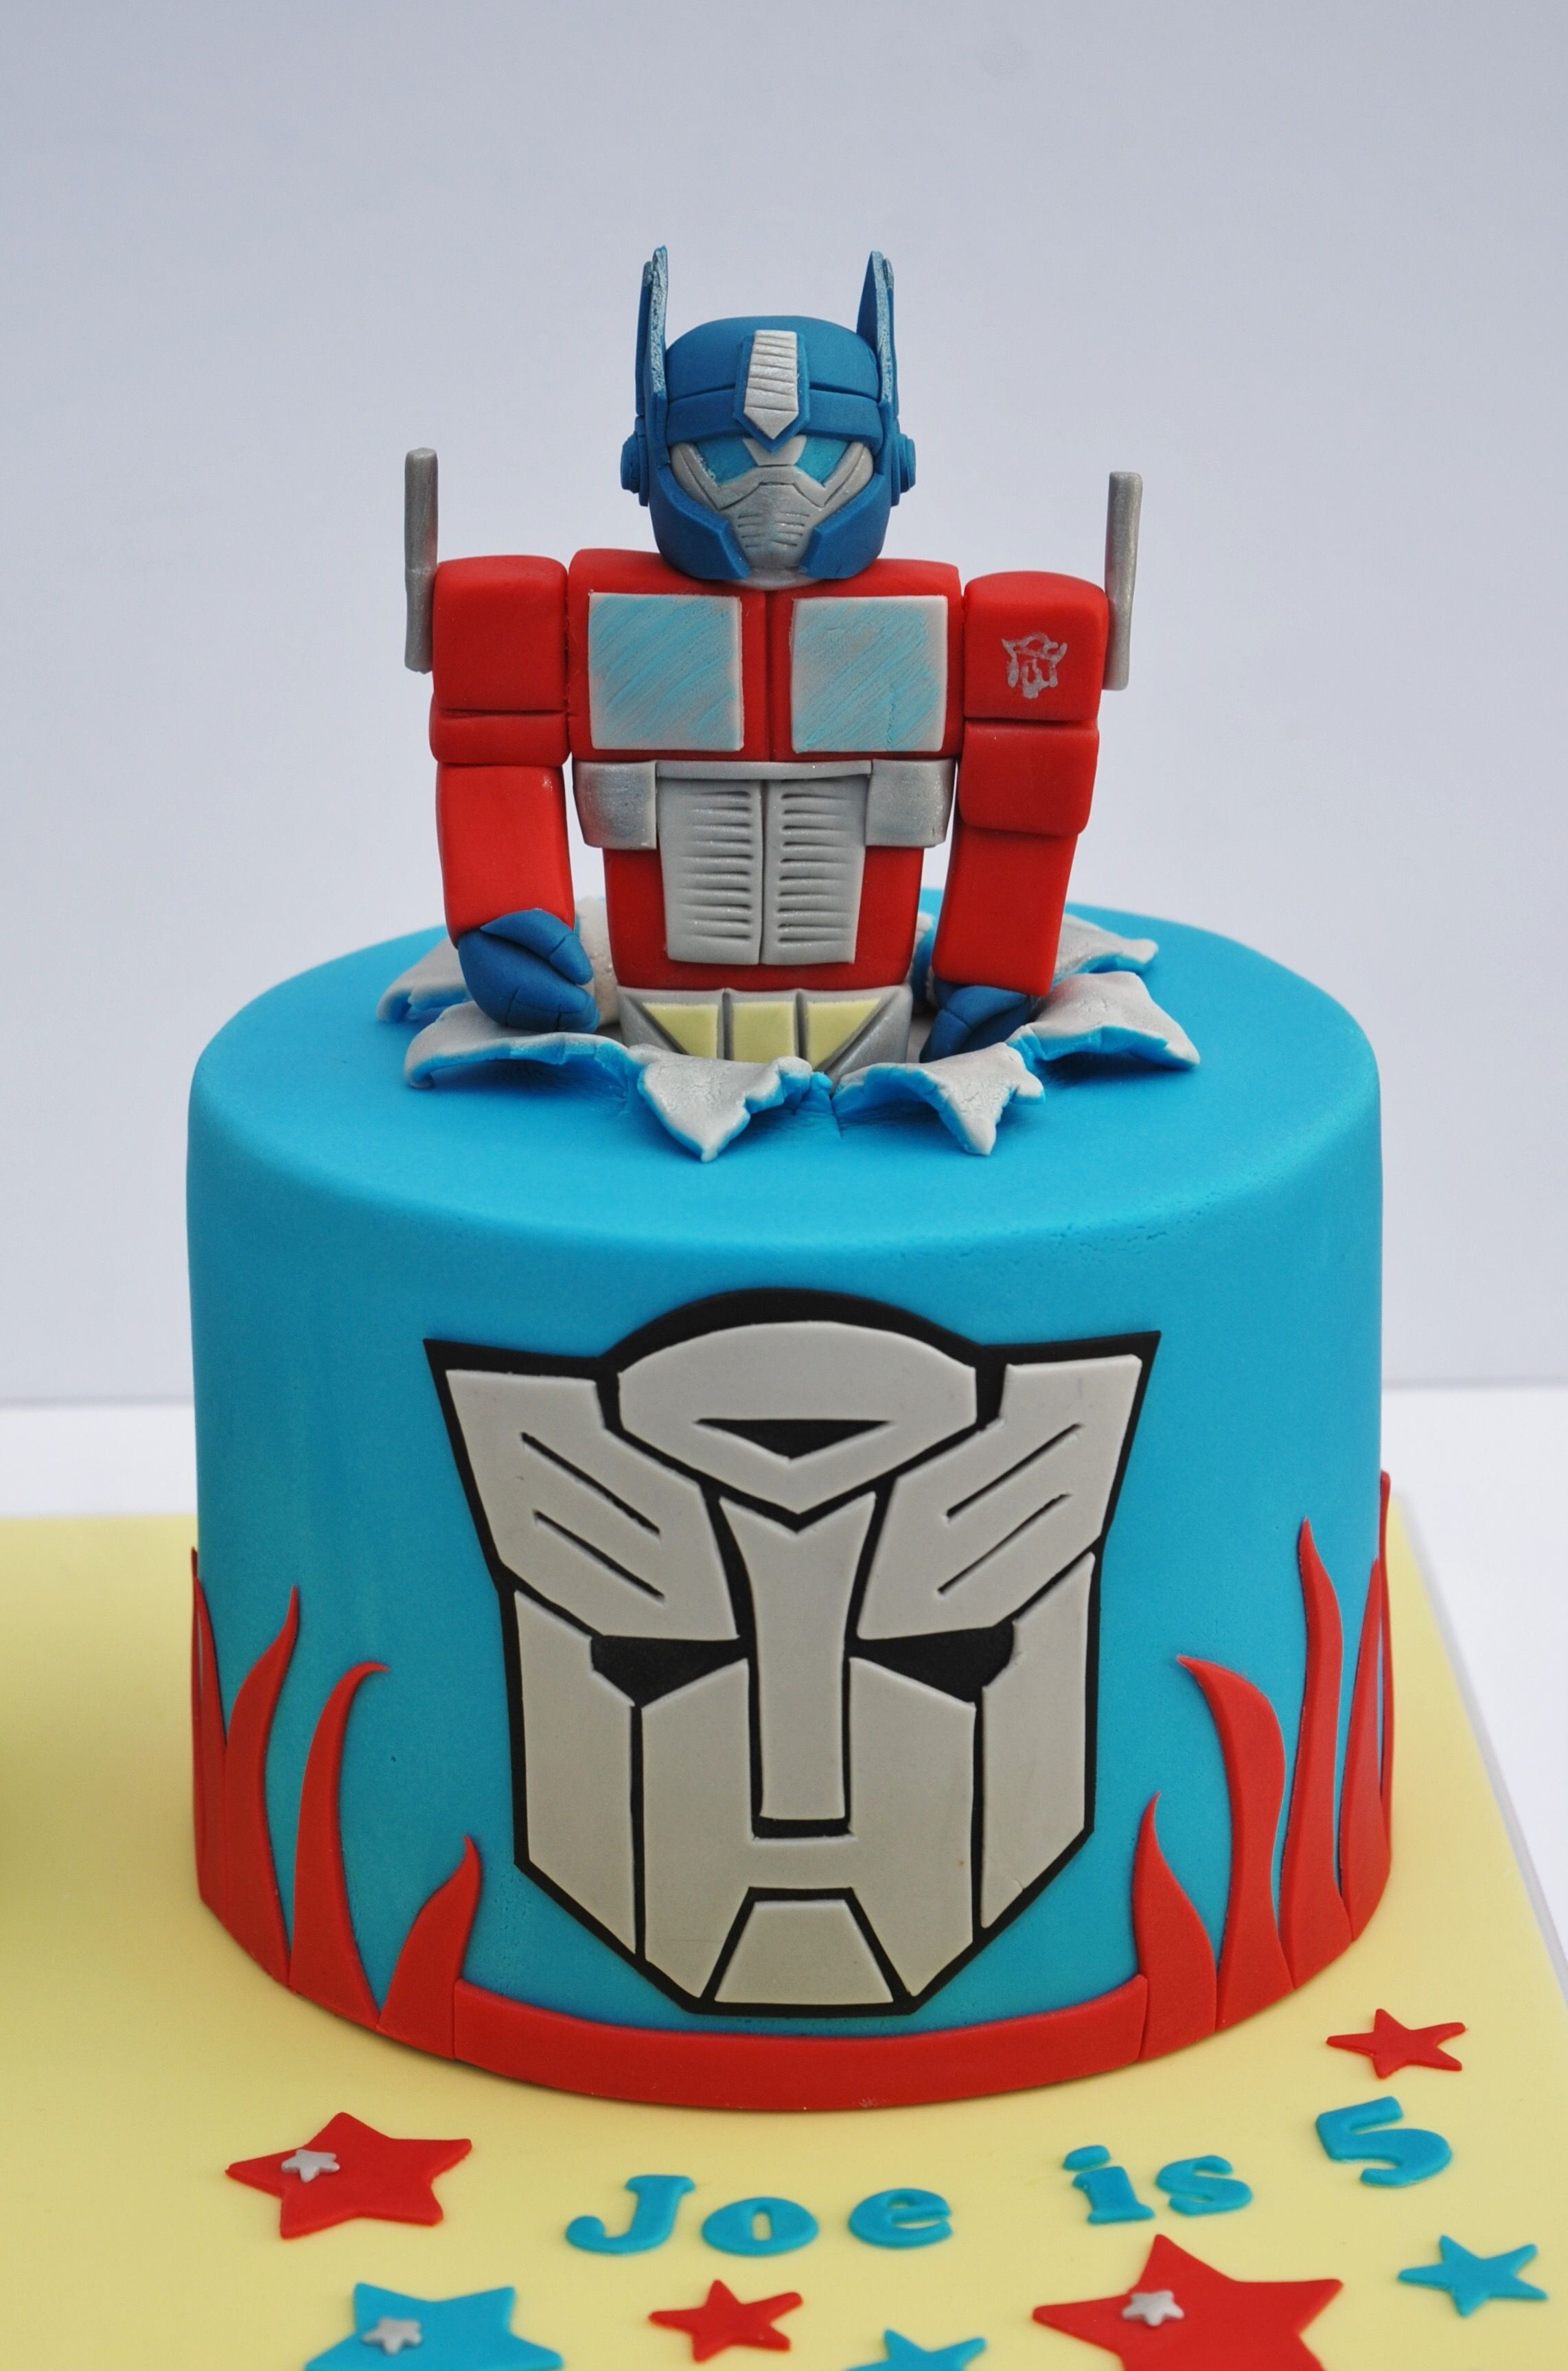 Strange Transformers Cake With Images Transformers Birthday Cake Funny Birthday Cards Online Alyptdamsfinfo